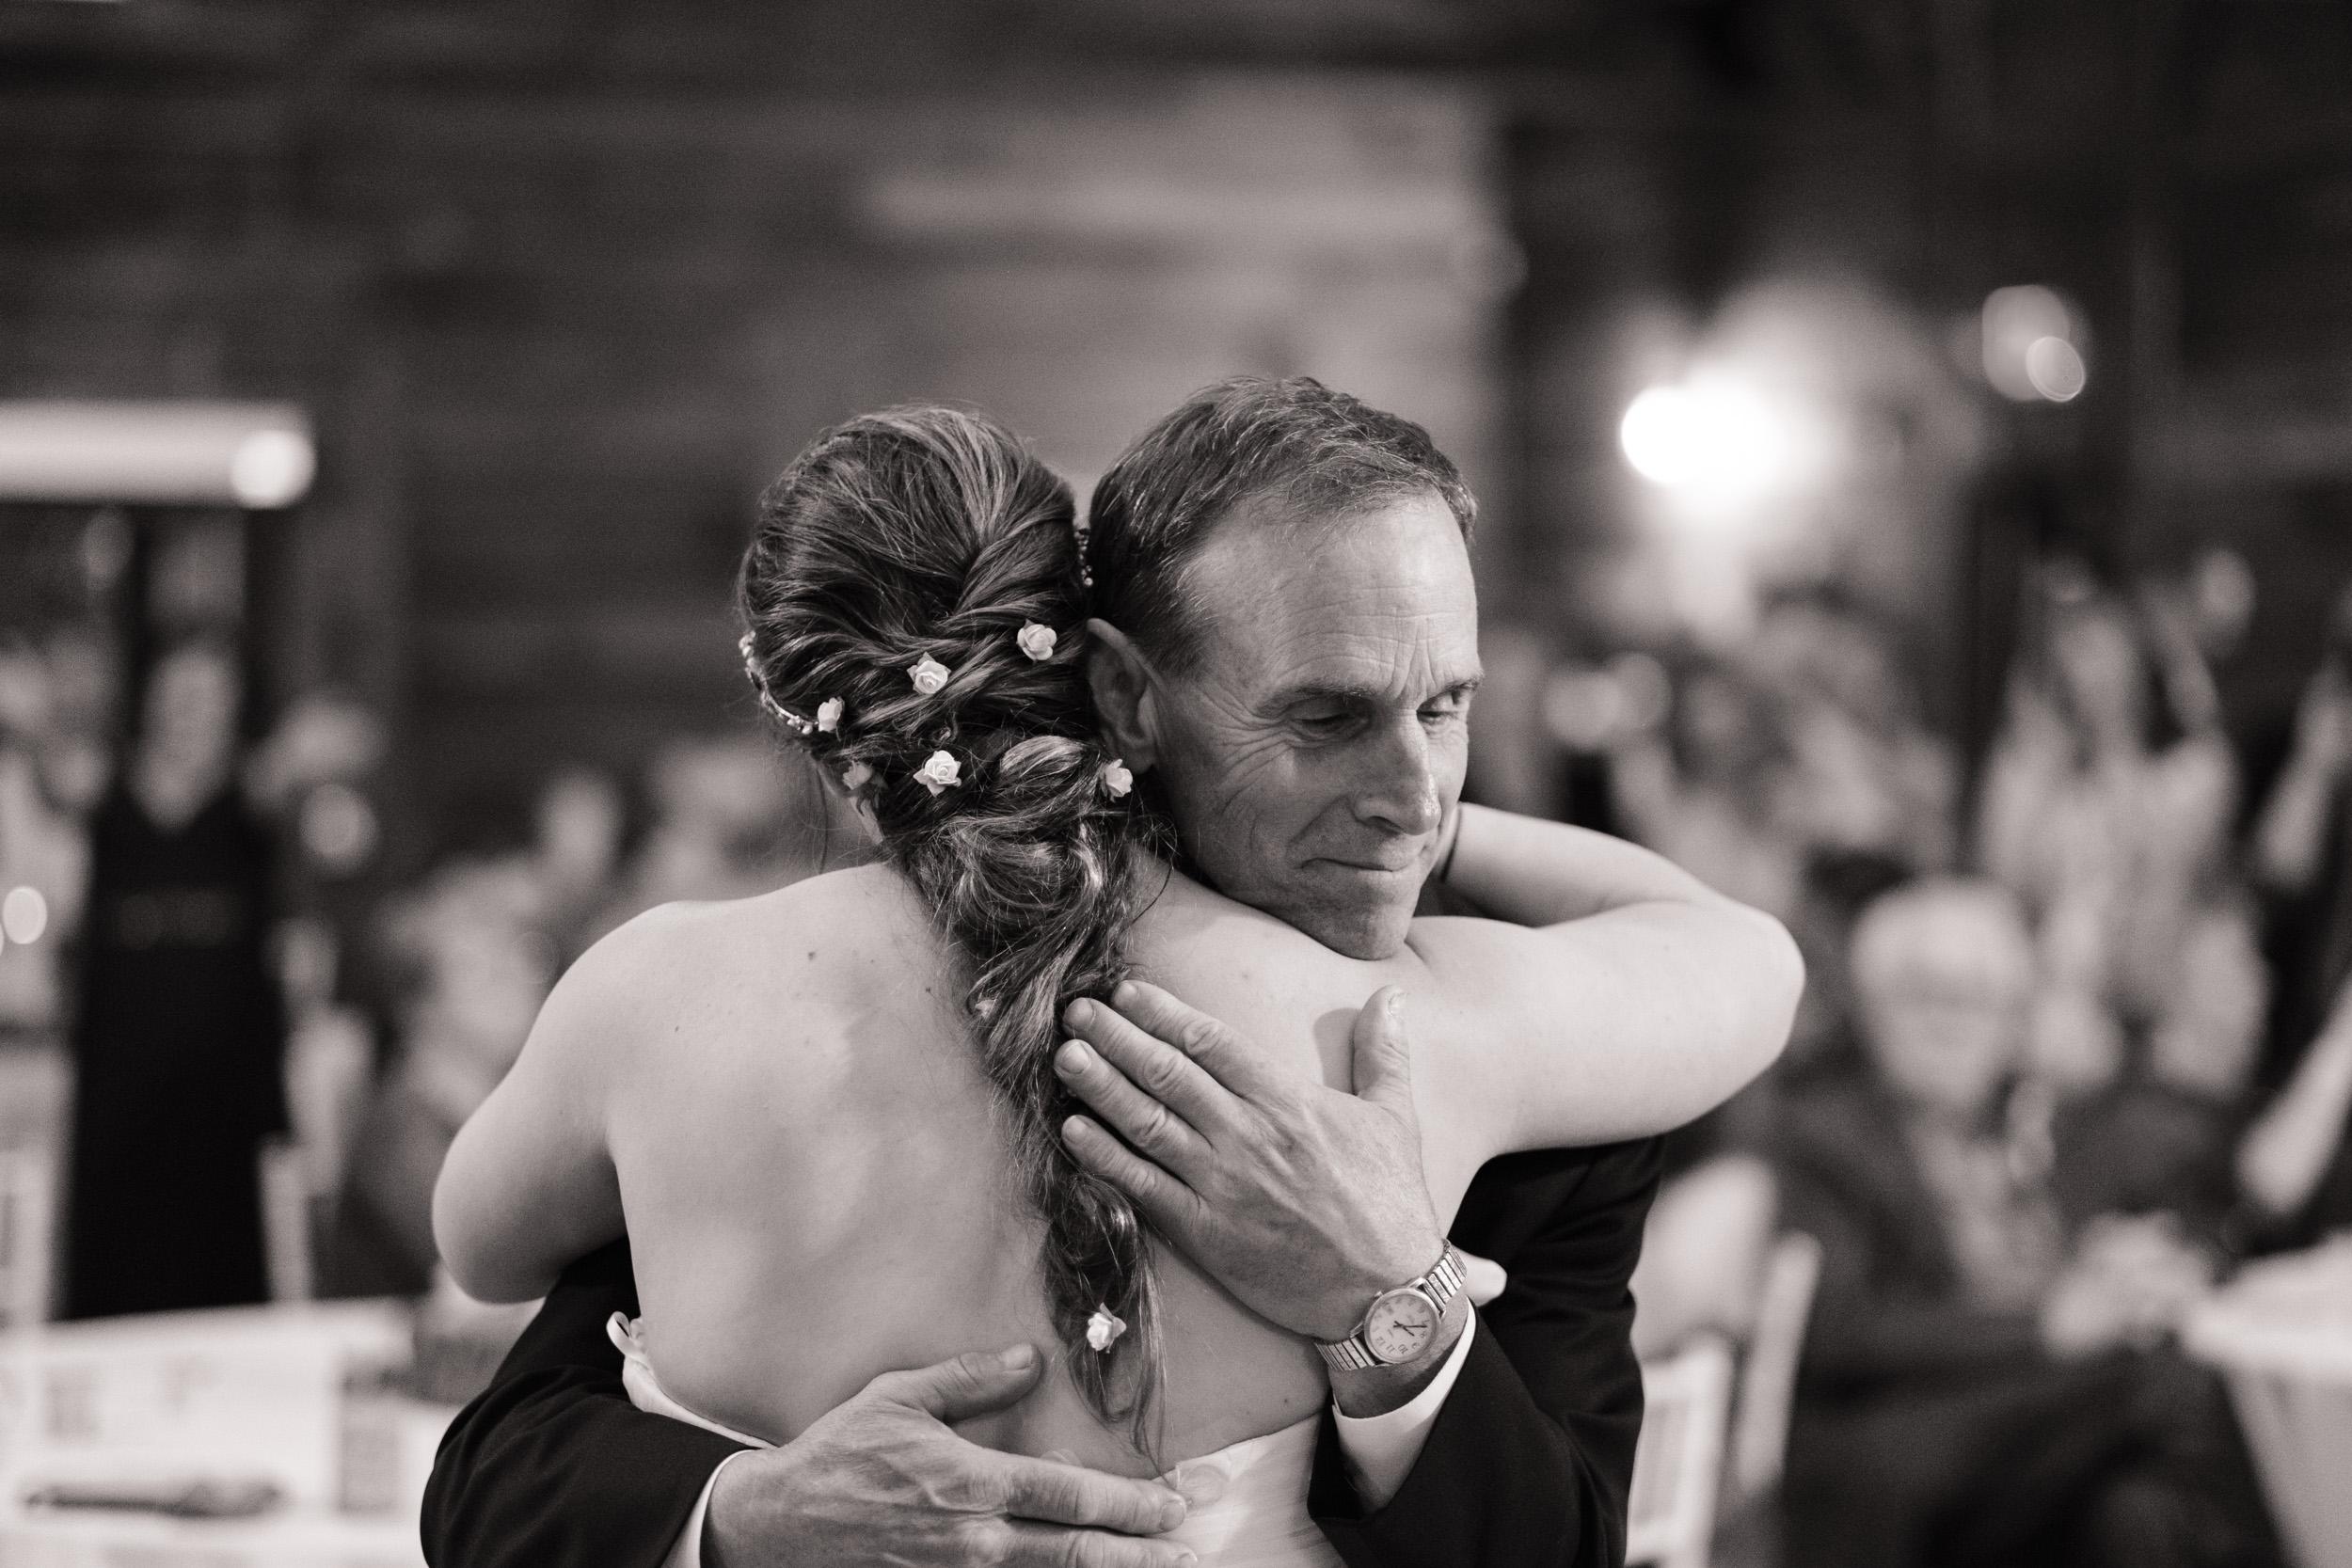 19-06-22-Ryan-Katie-The-Fields-Reserve-Wedding-78.jpg